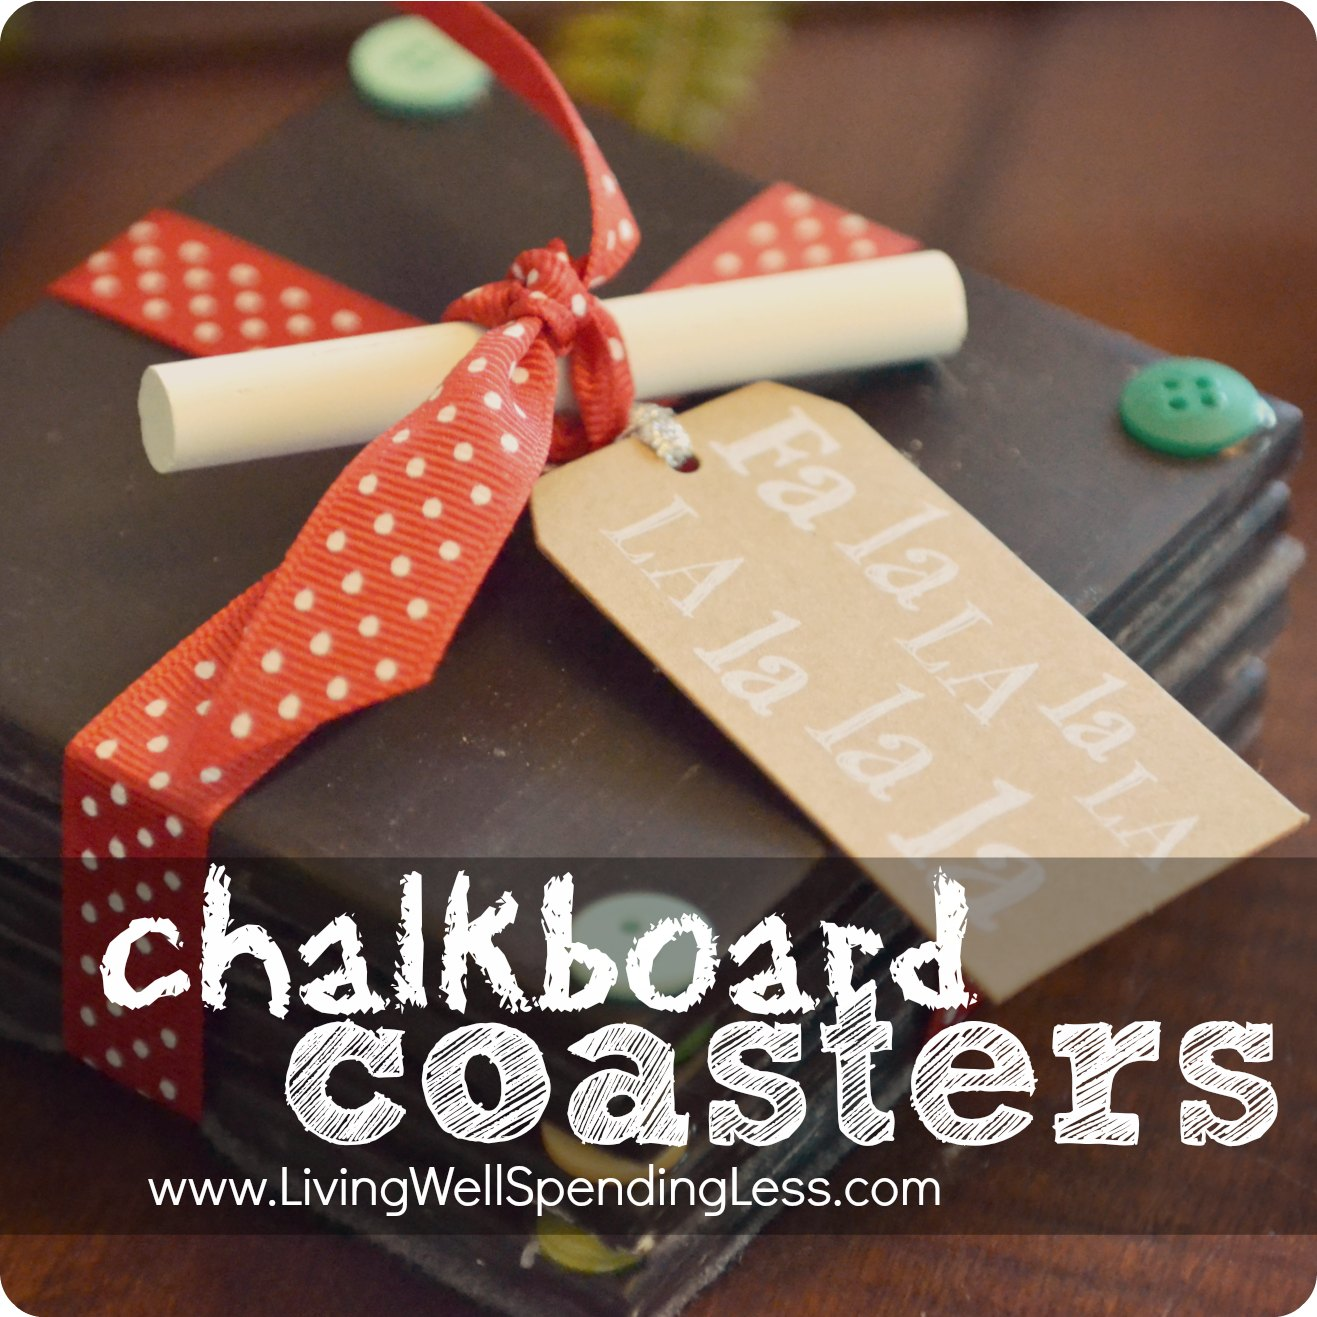 DiY Chalkboard Coasters-super Cute Handmade Gift Idea